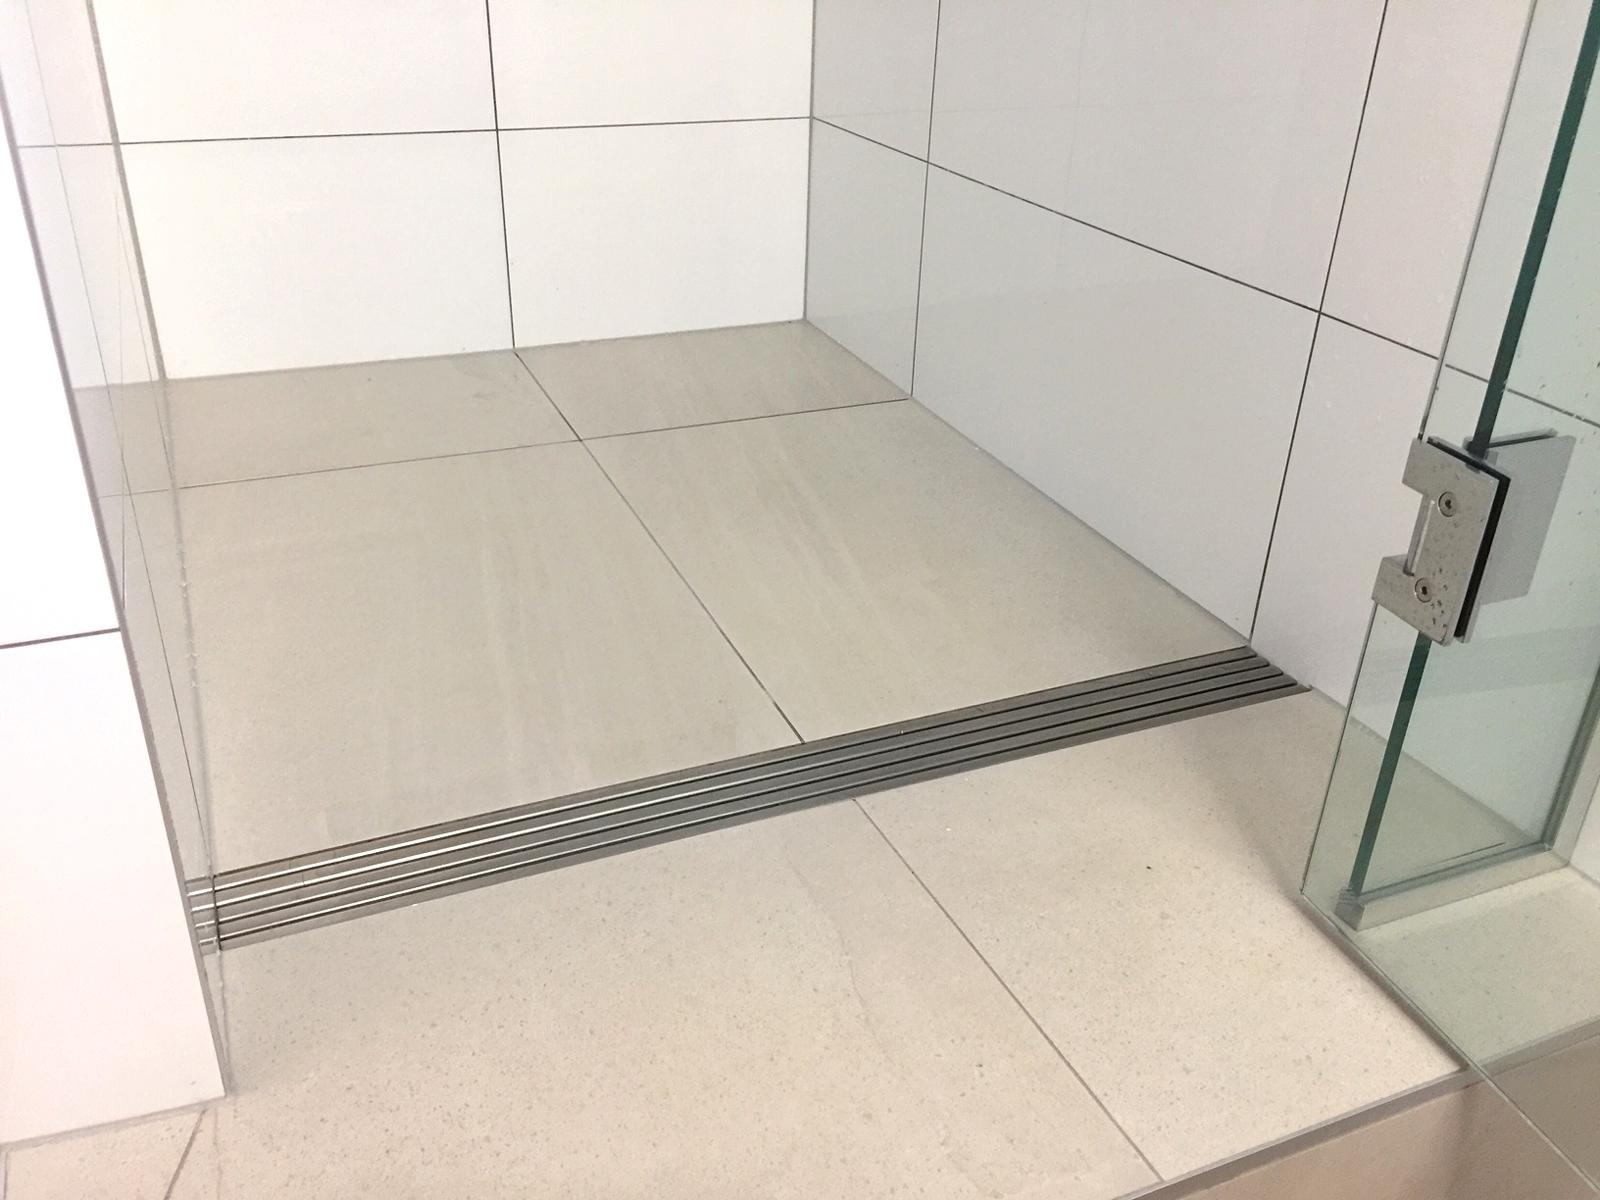 JESANI-Shower-Channel-Centre-2a.jpg